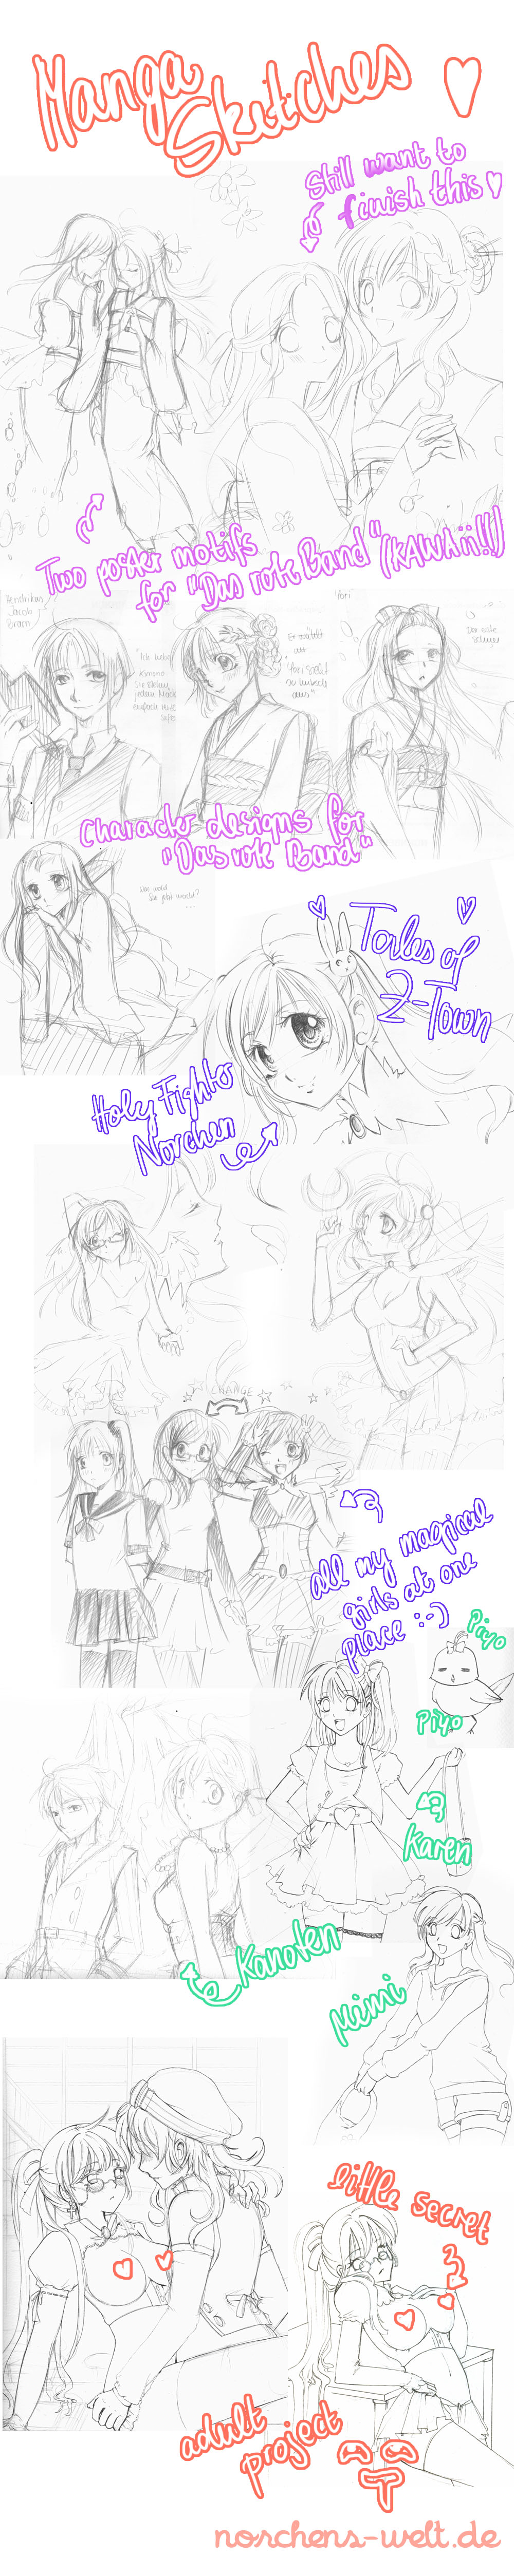 manga_compilation